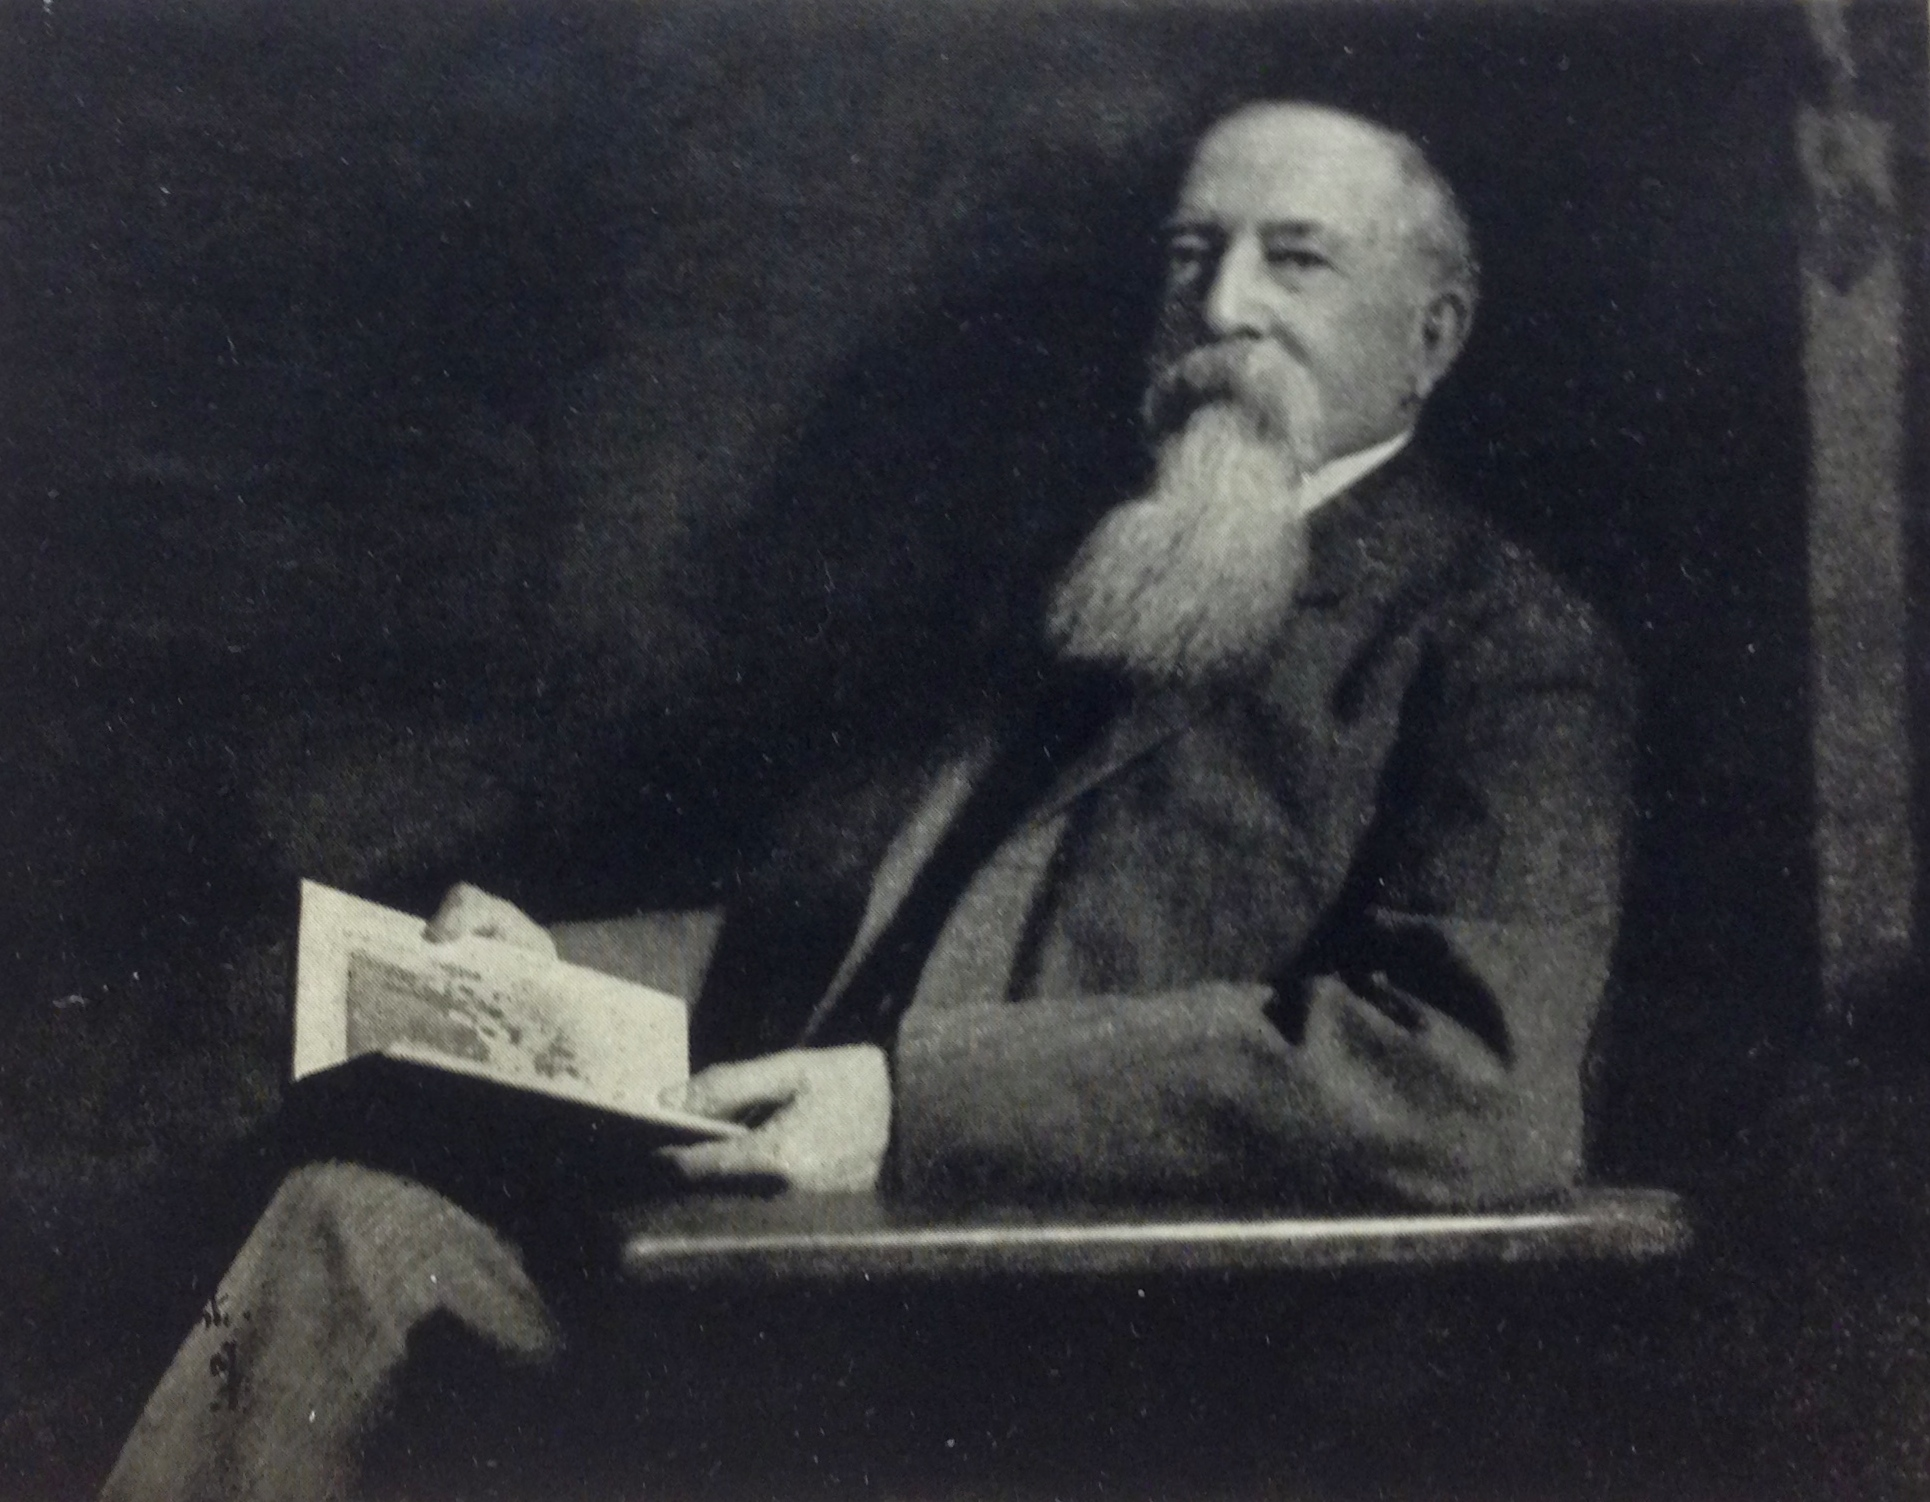 TS Hawkins photo from book.jpg